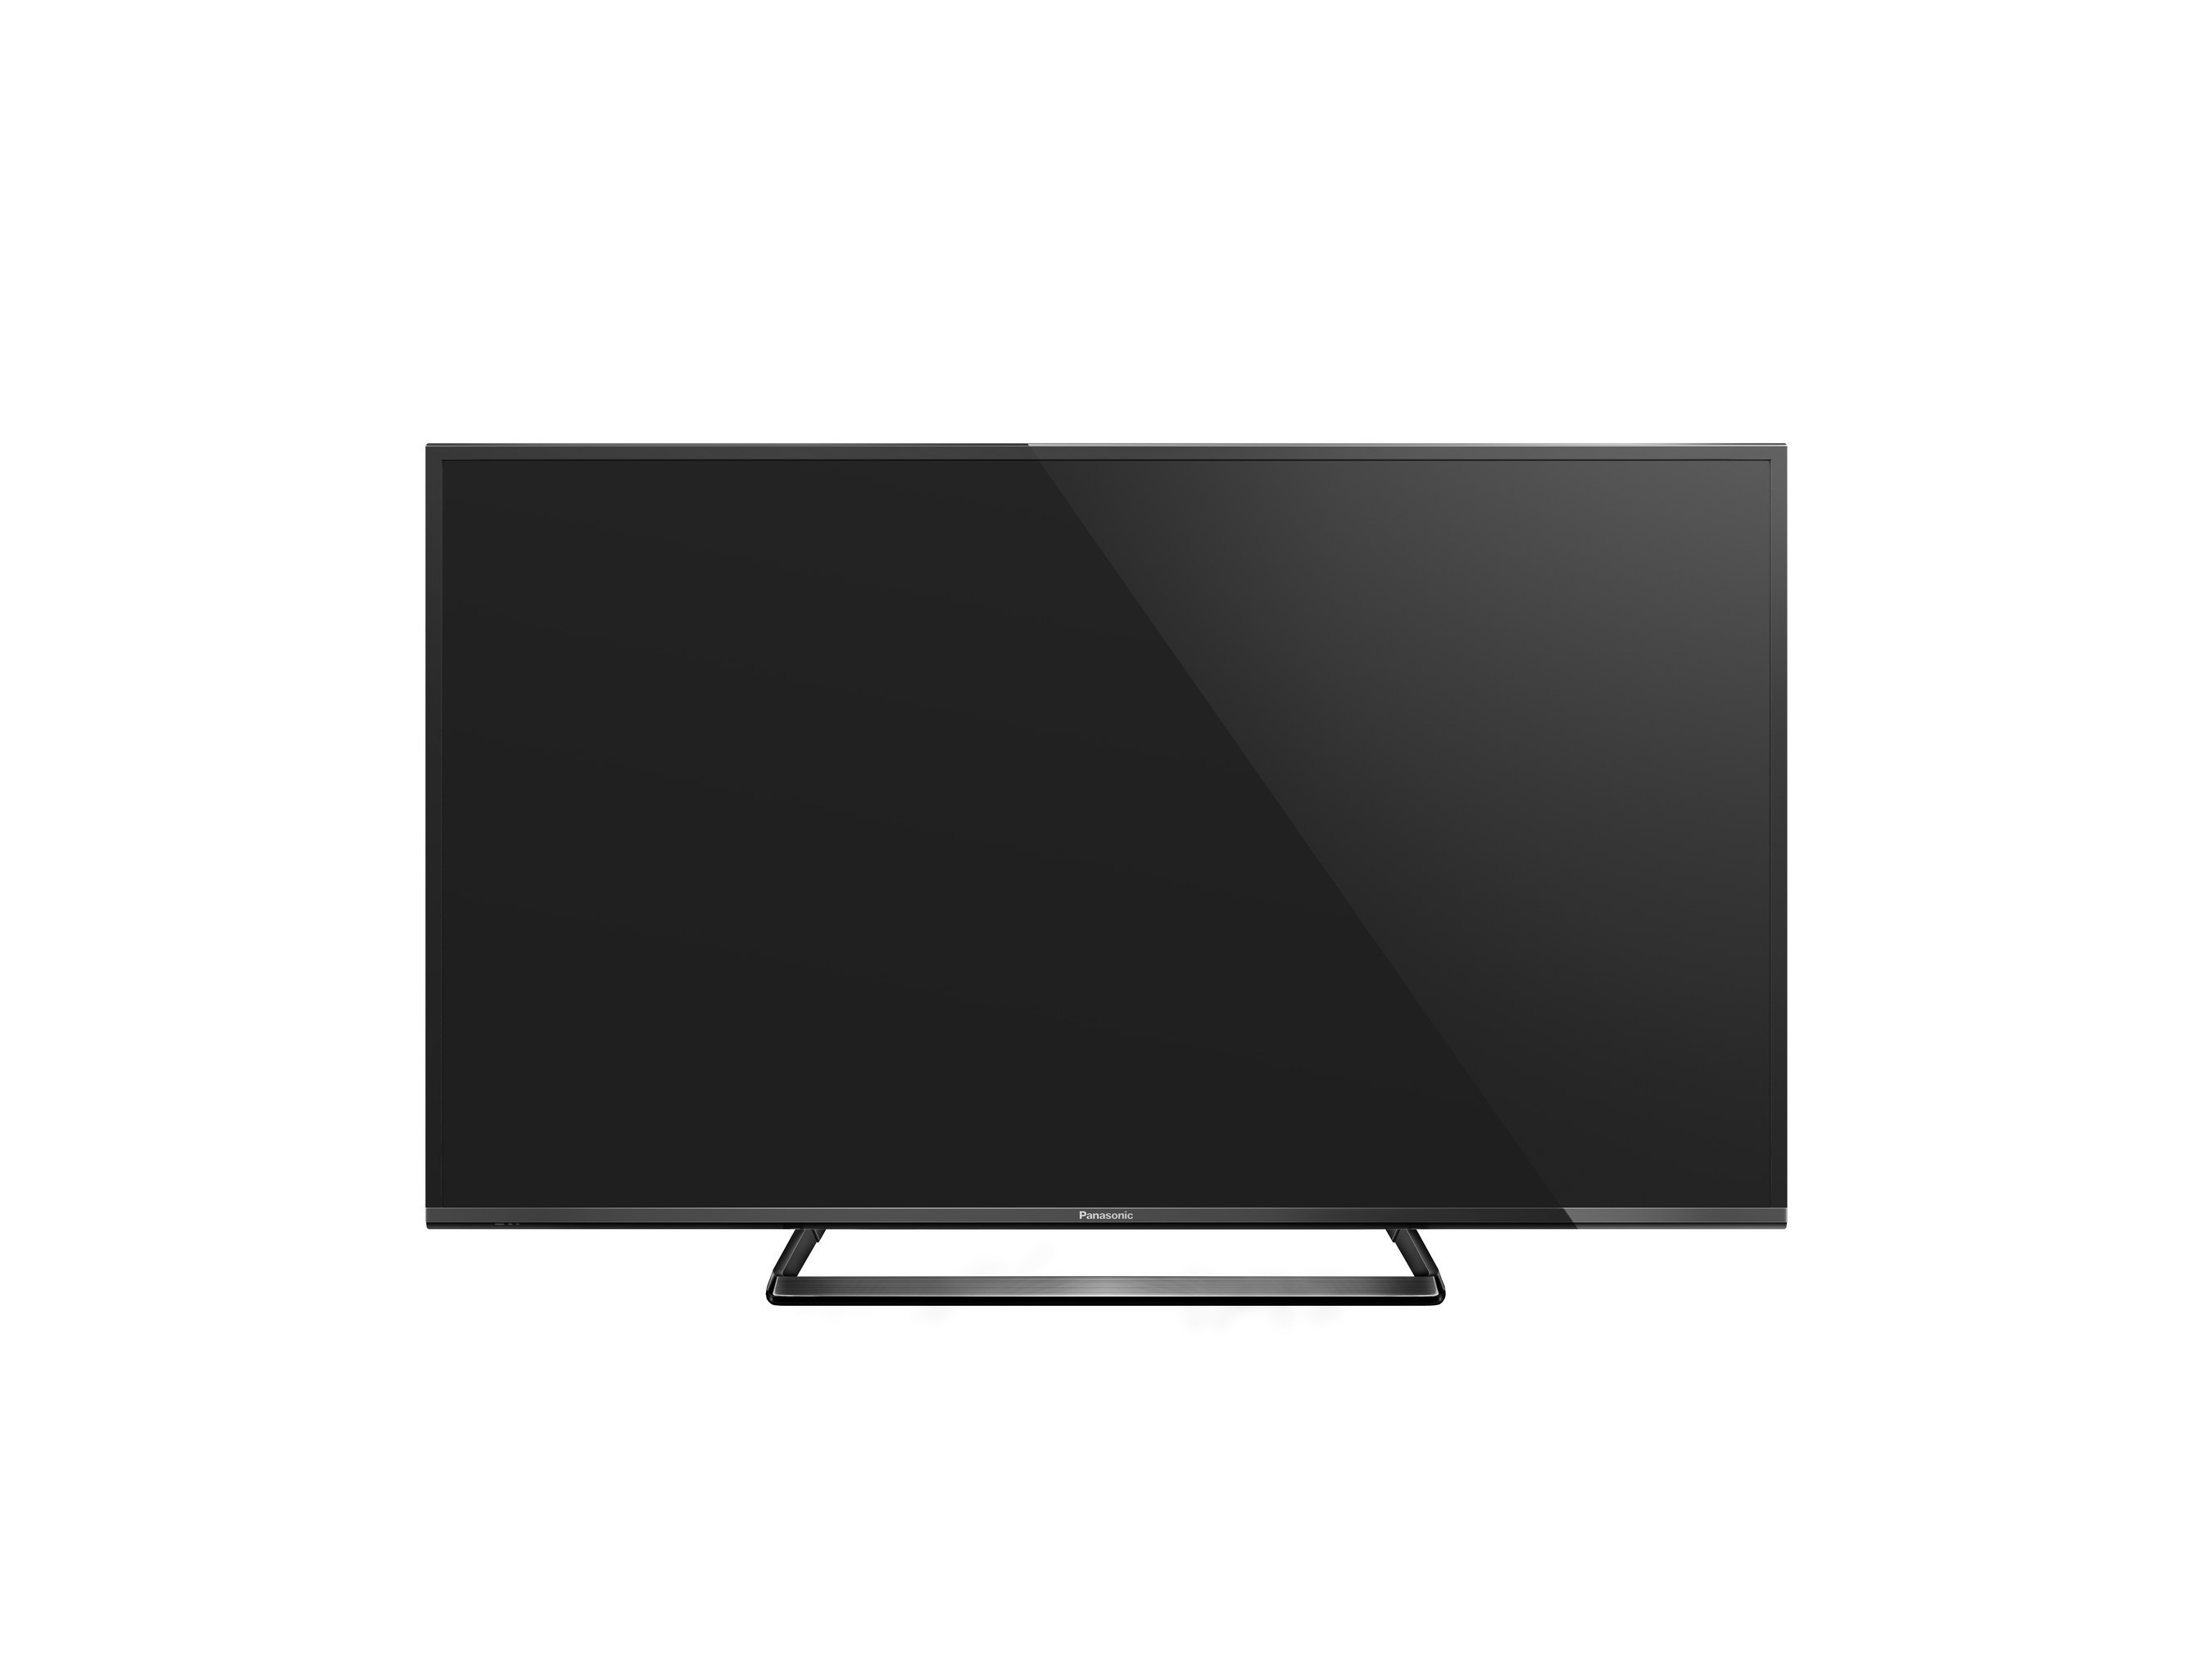 panasonic tc 50cx600u 4k uhd television named as 2015 ces innovation awards honoree. Black Bedroom Furniture Sets. Home Design Ideas